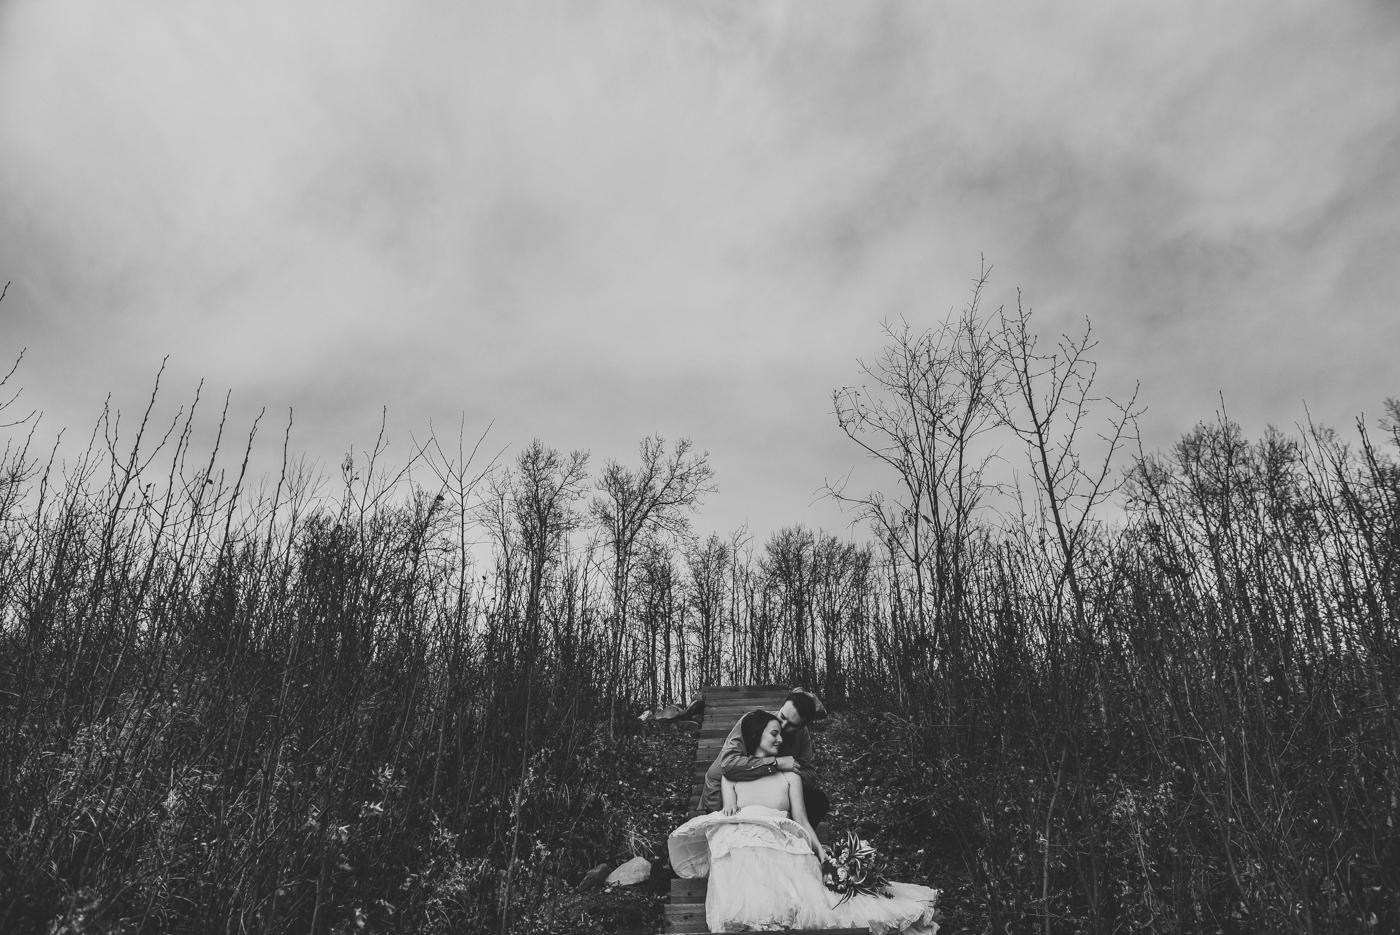 FortSt.John_photographer_TyraEPhotography_Wedding_Couple_Family_Photograhy_DawsonCreek_Elopement_Bride_Boduoir_Portraits-23.jpg